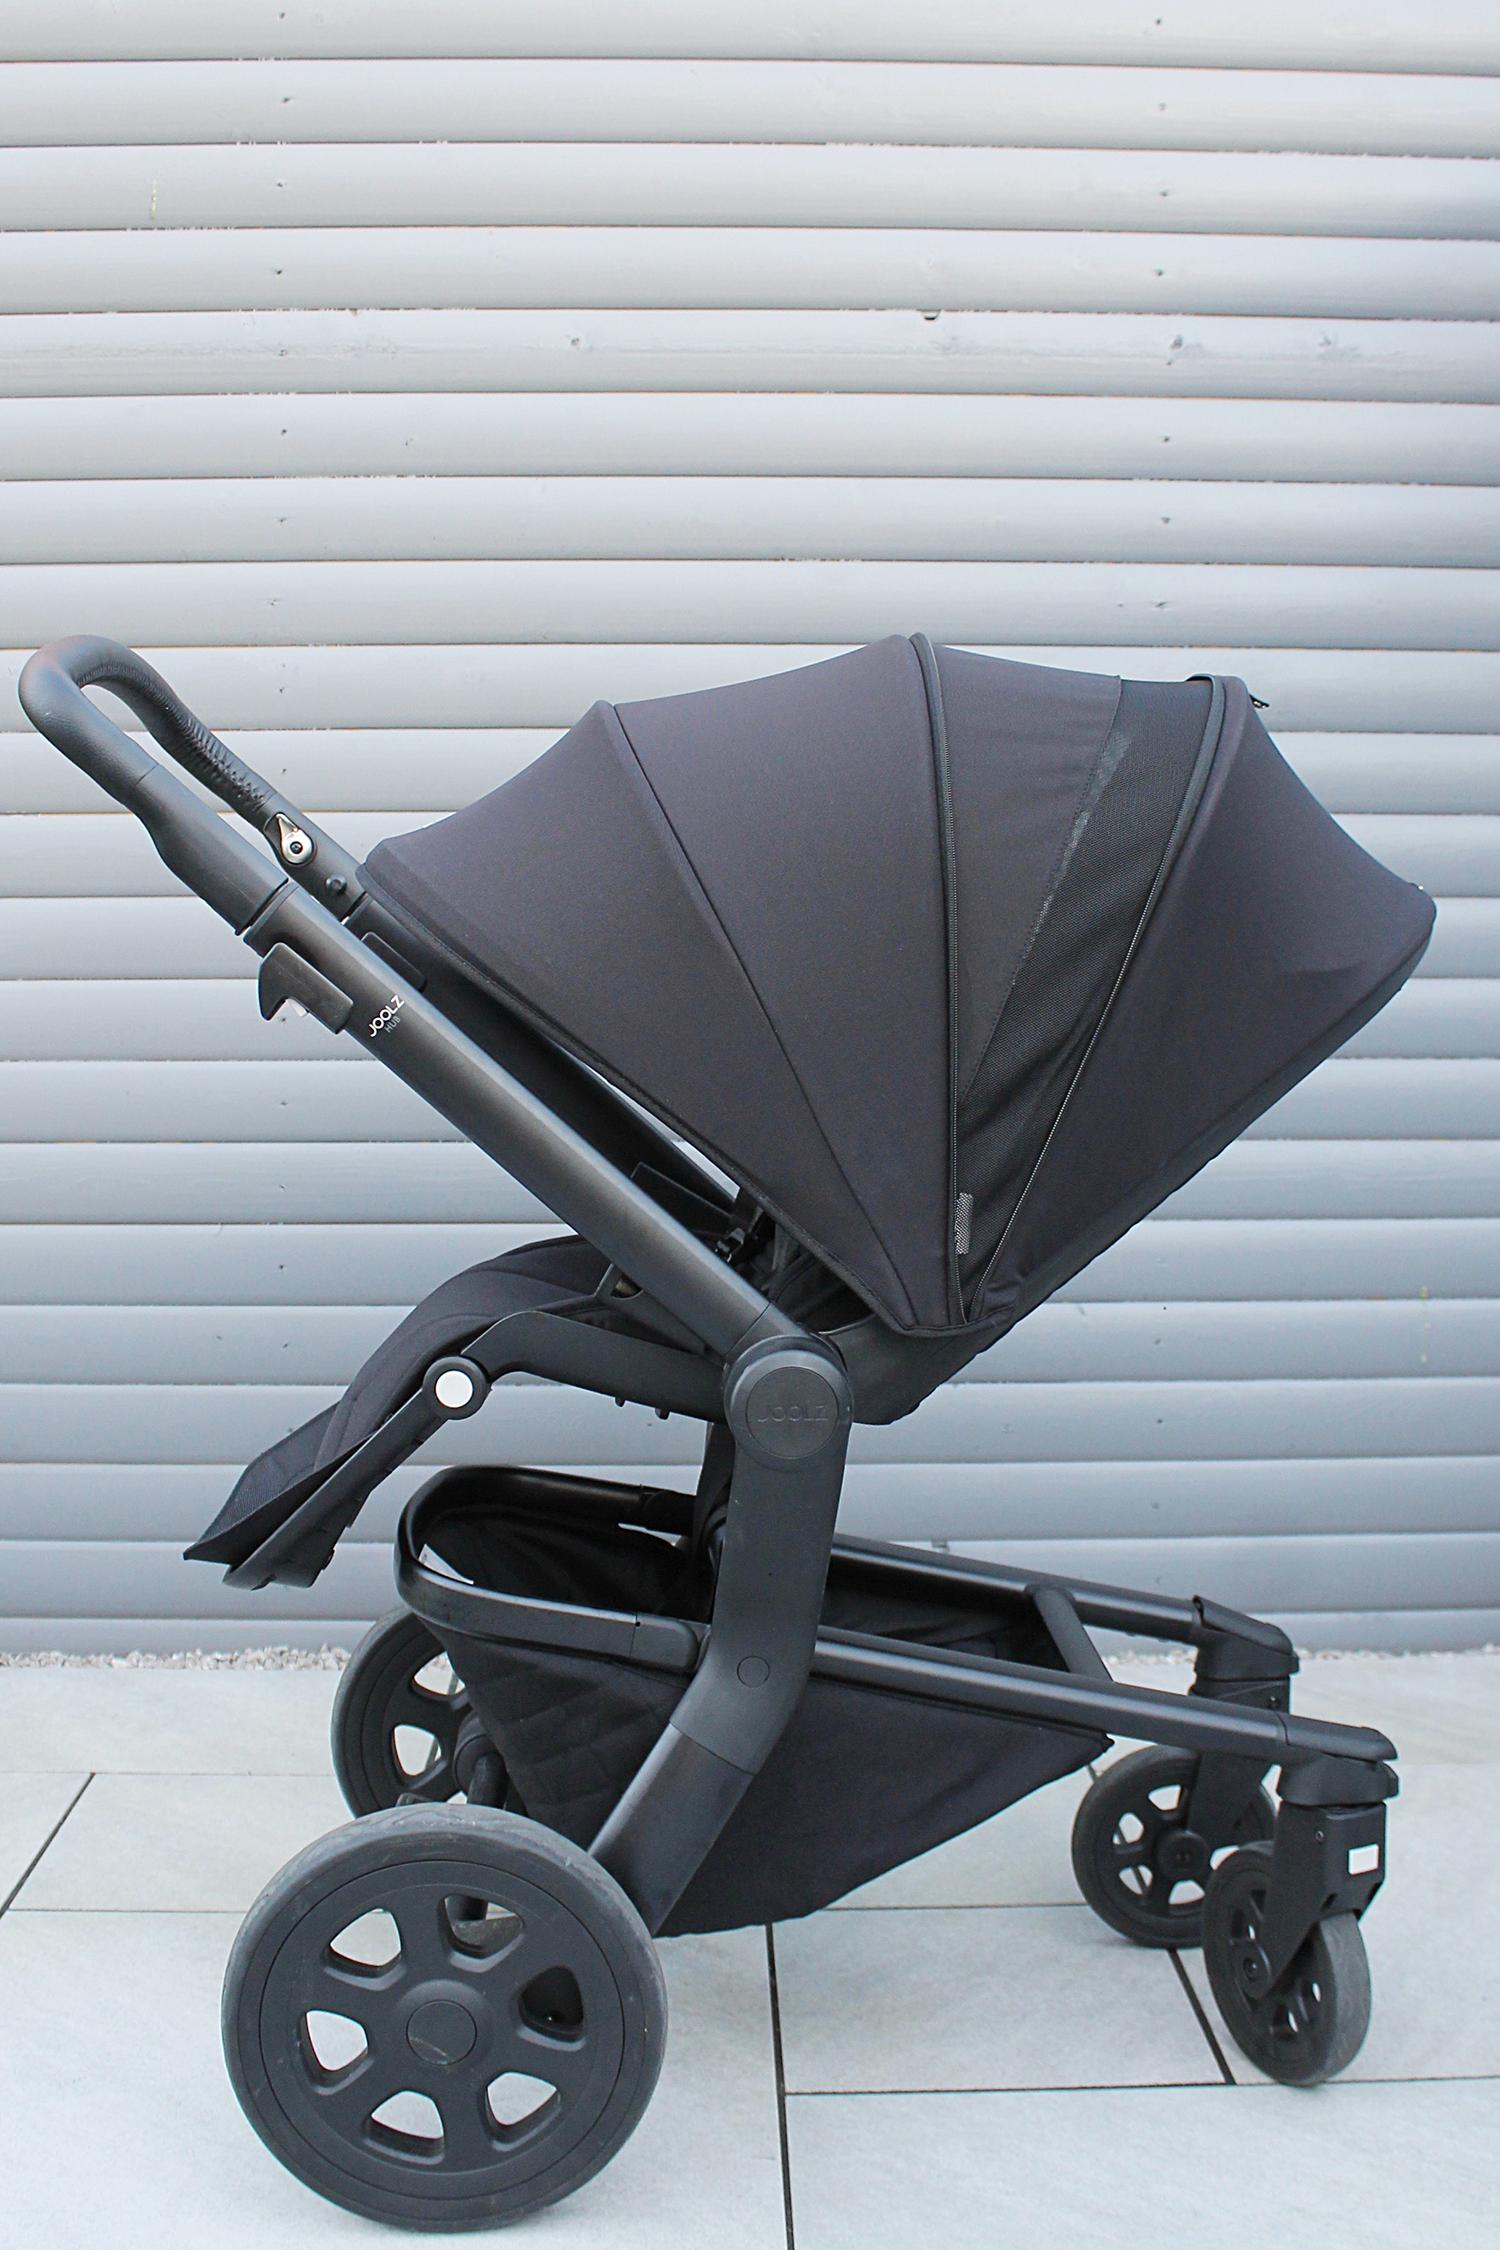 Joolz Hub Stroller in black